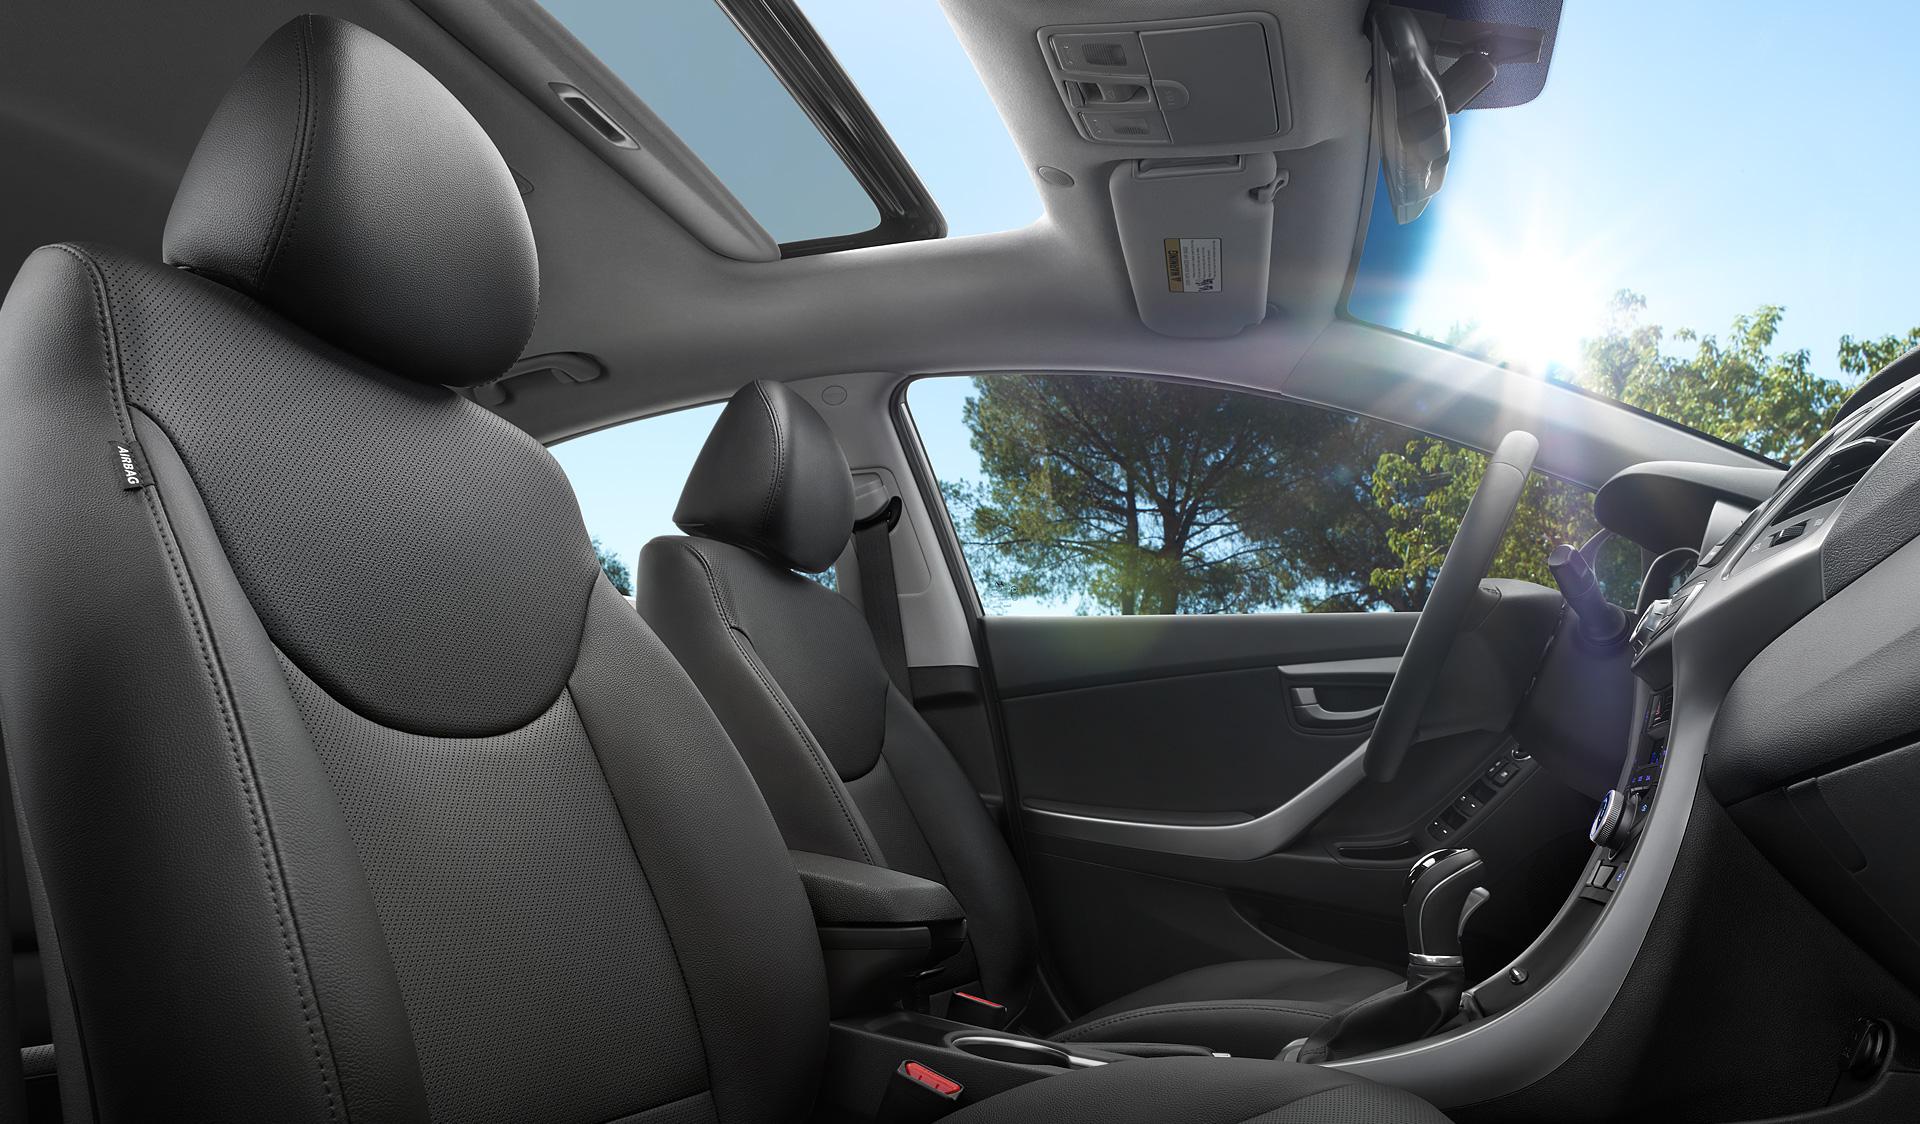 2016 Hyundai Elantra Vs 2016 Toyota Corolla